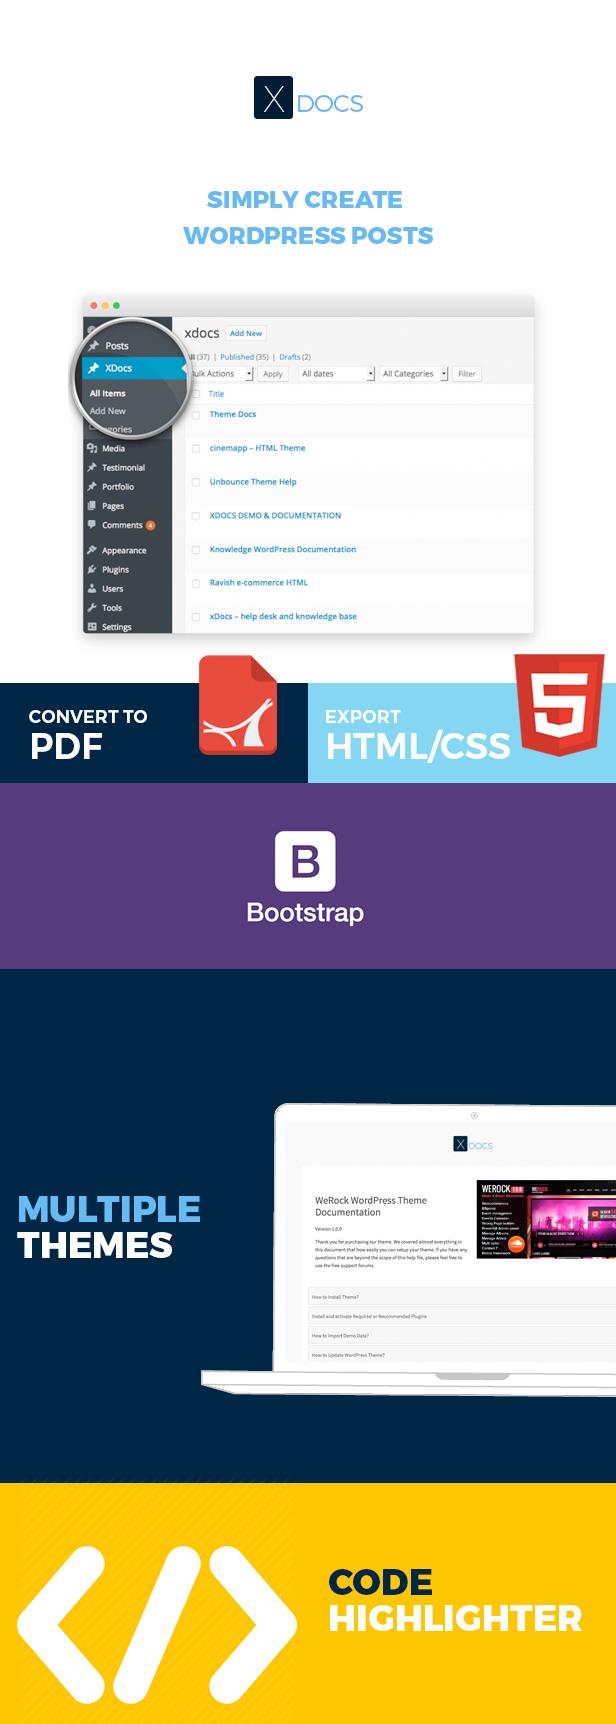 X Docs WordPress Product Documentation Creator - 1